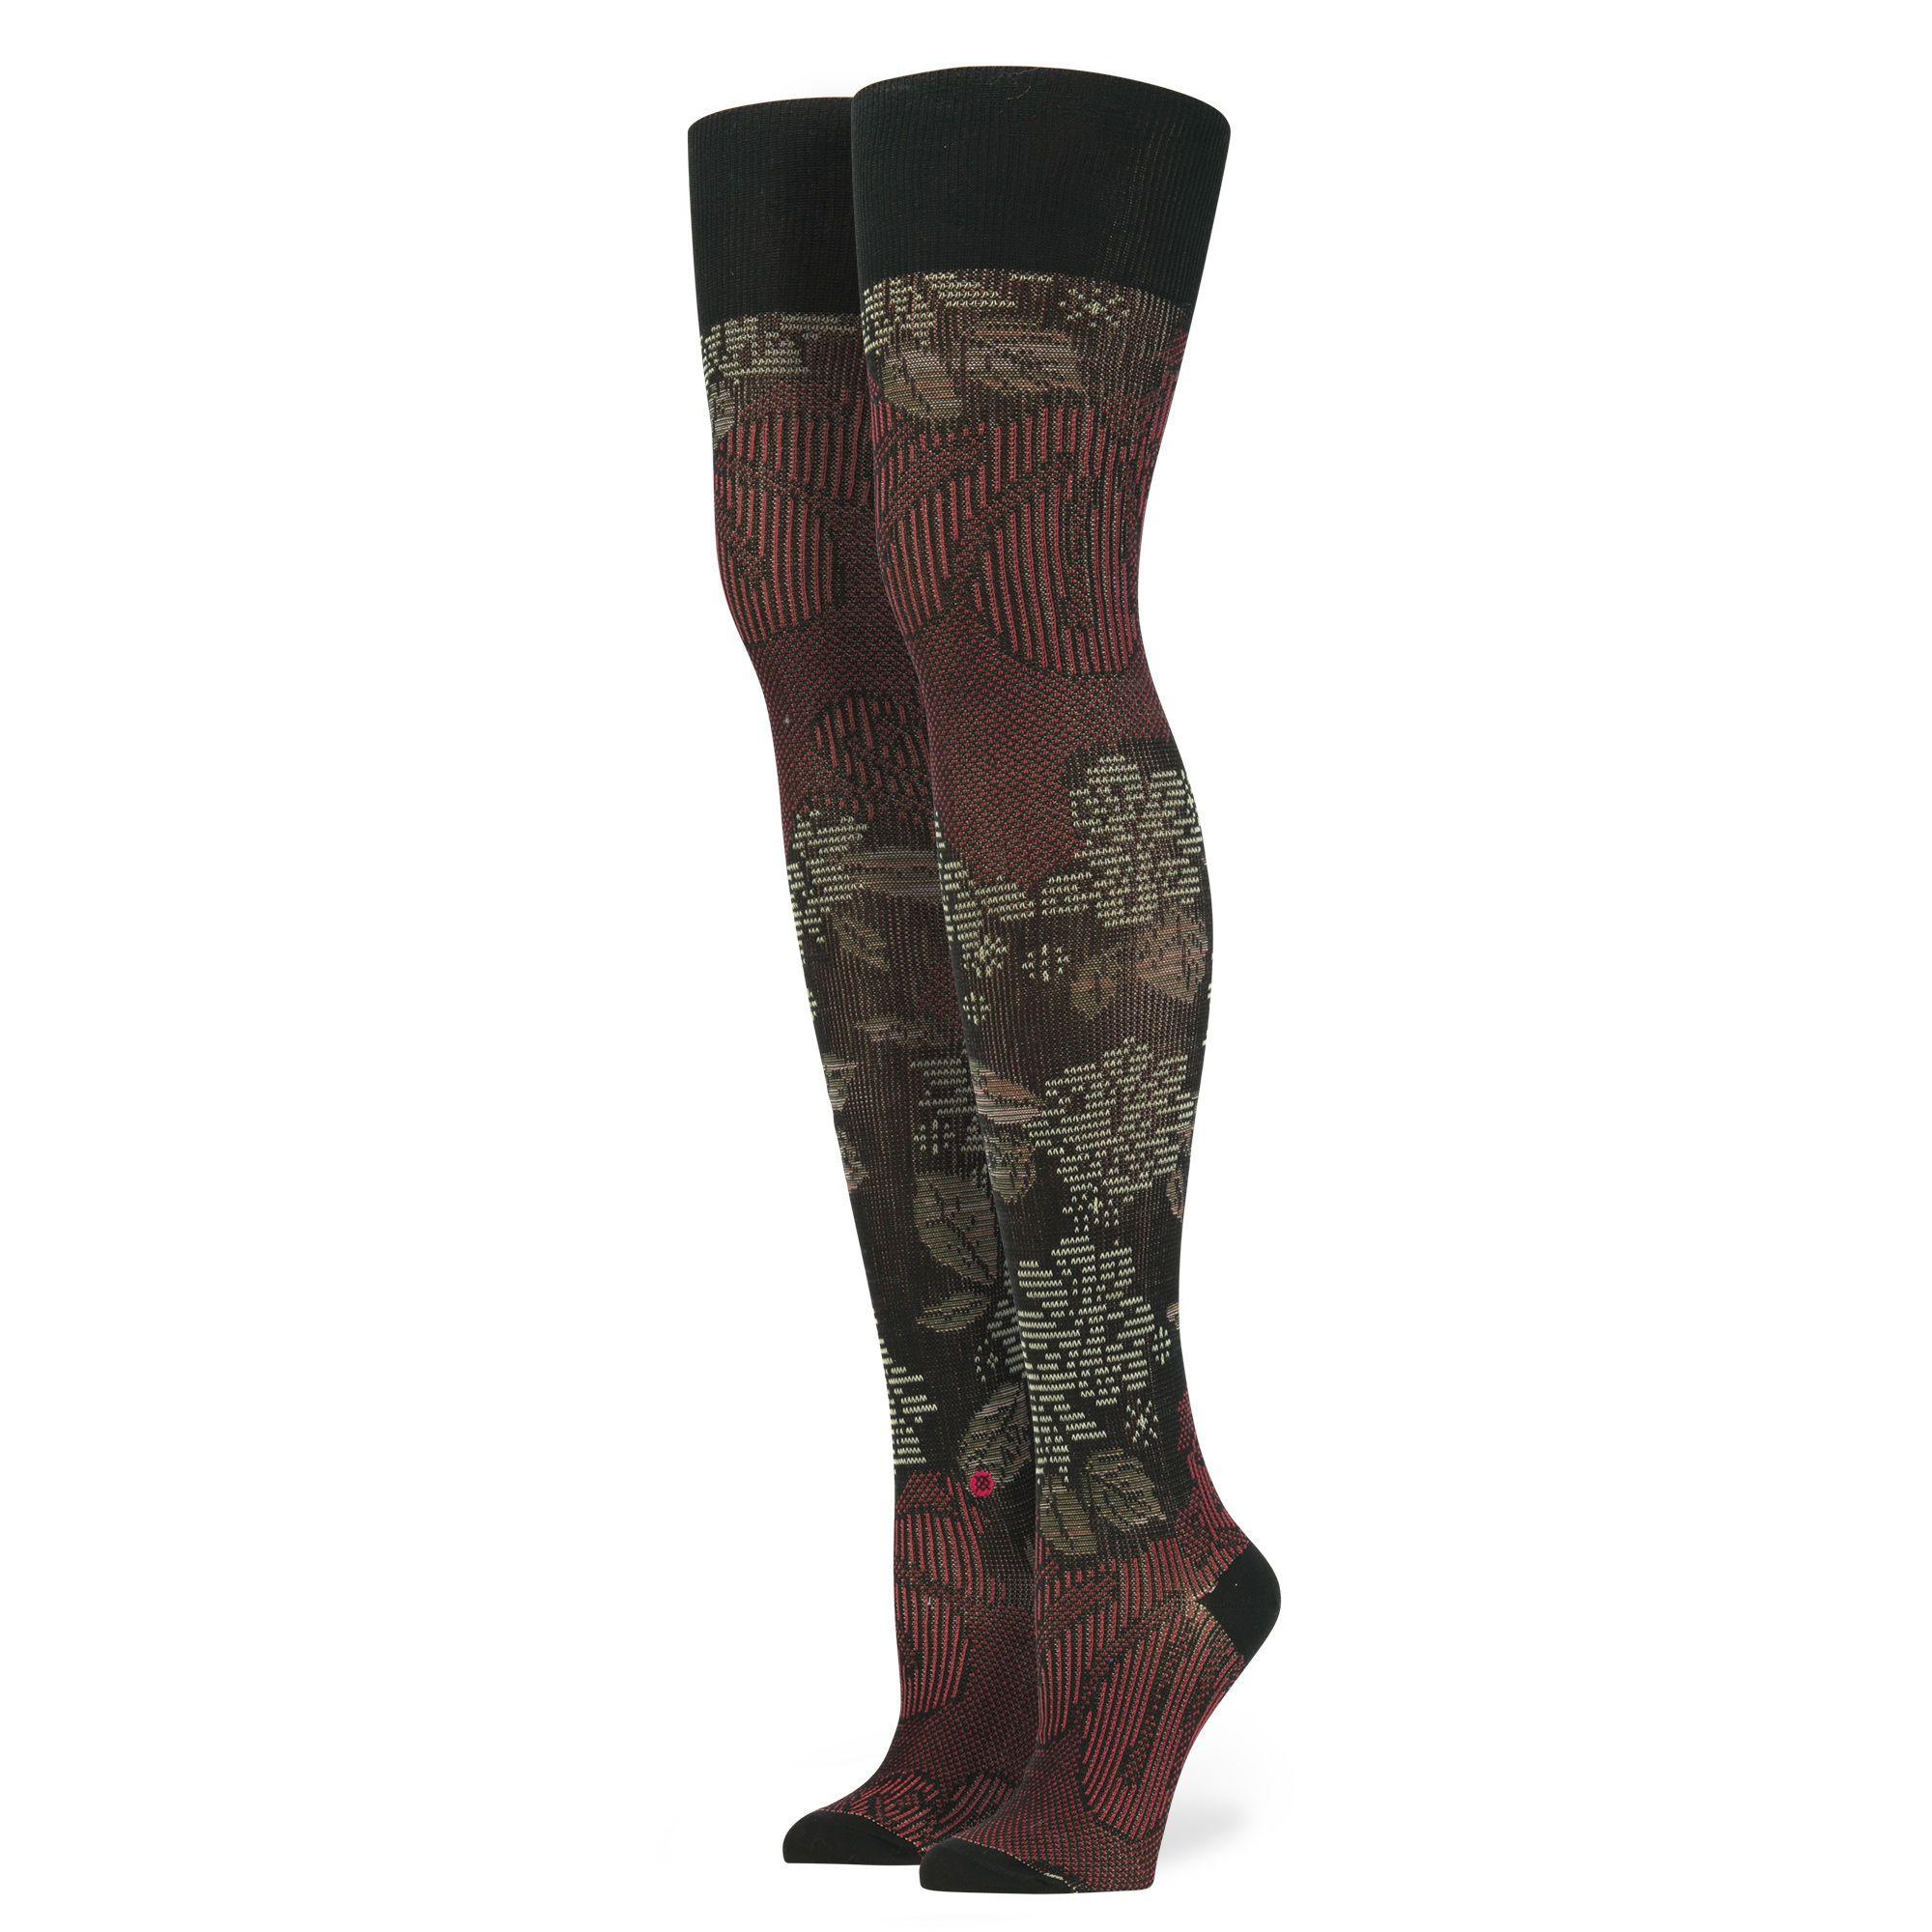 Lotus Thigh High Stance Us Thigh High Tights Thigh High Socks Thigh High Stockings